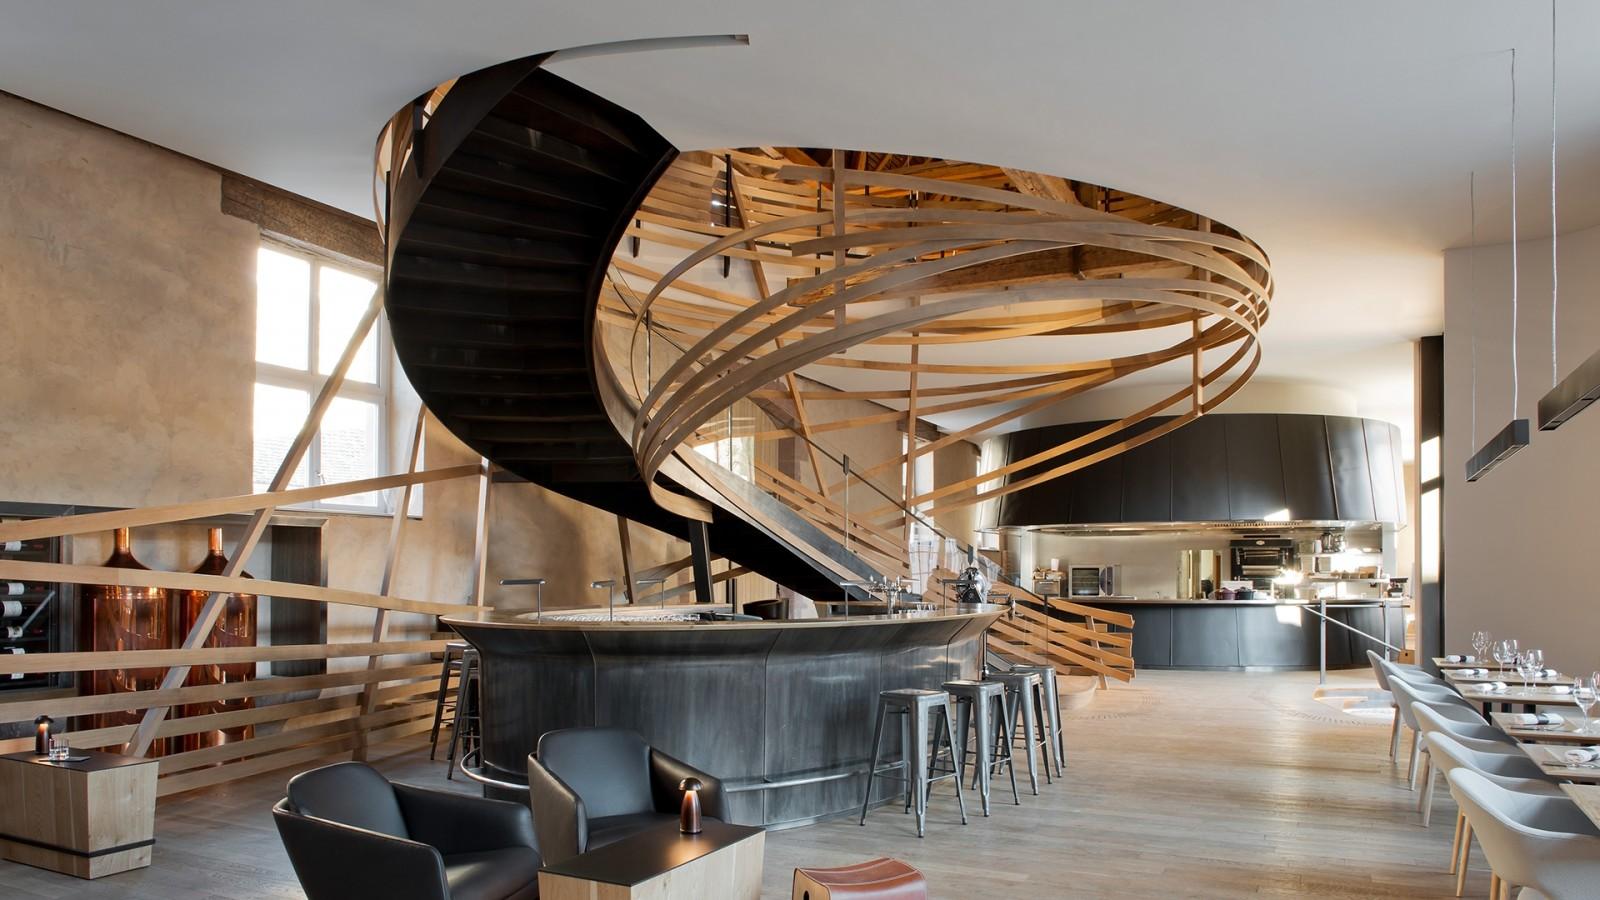 Inspirational Interior Designers Patrick Jouin_Brasserie Les Haras